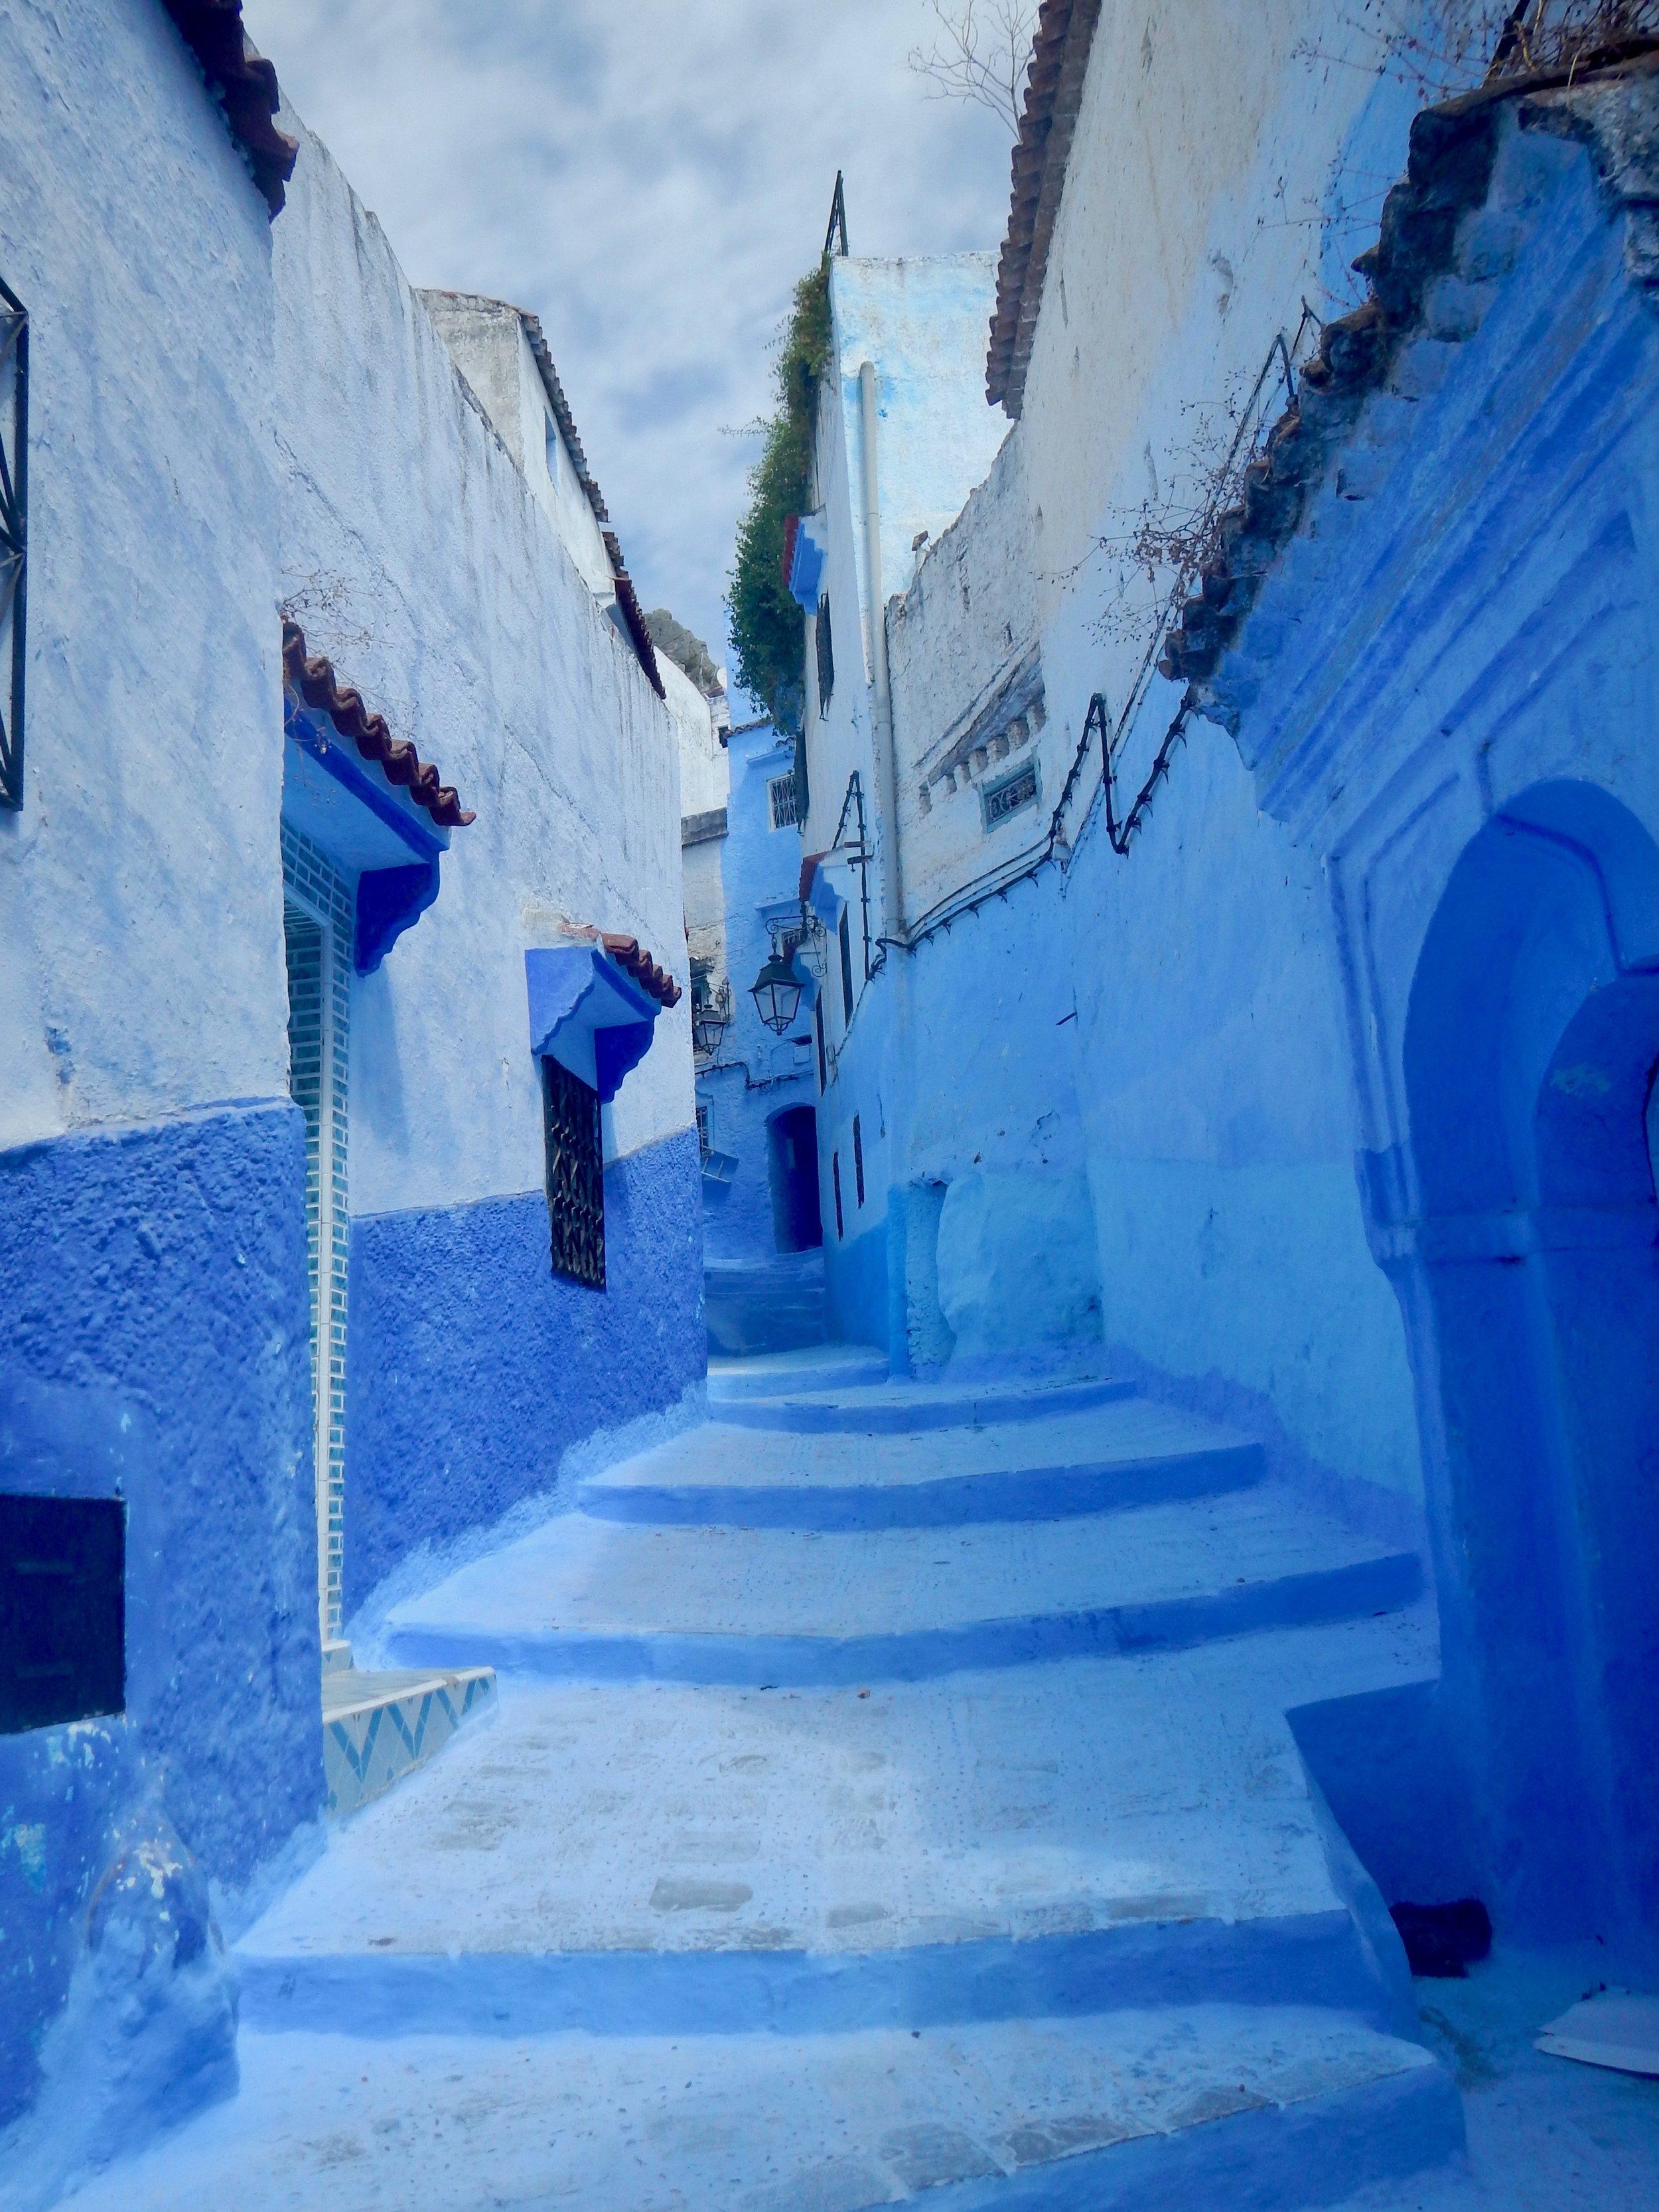 Chefchaouen, Morocco, @acrosslandsea